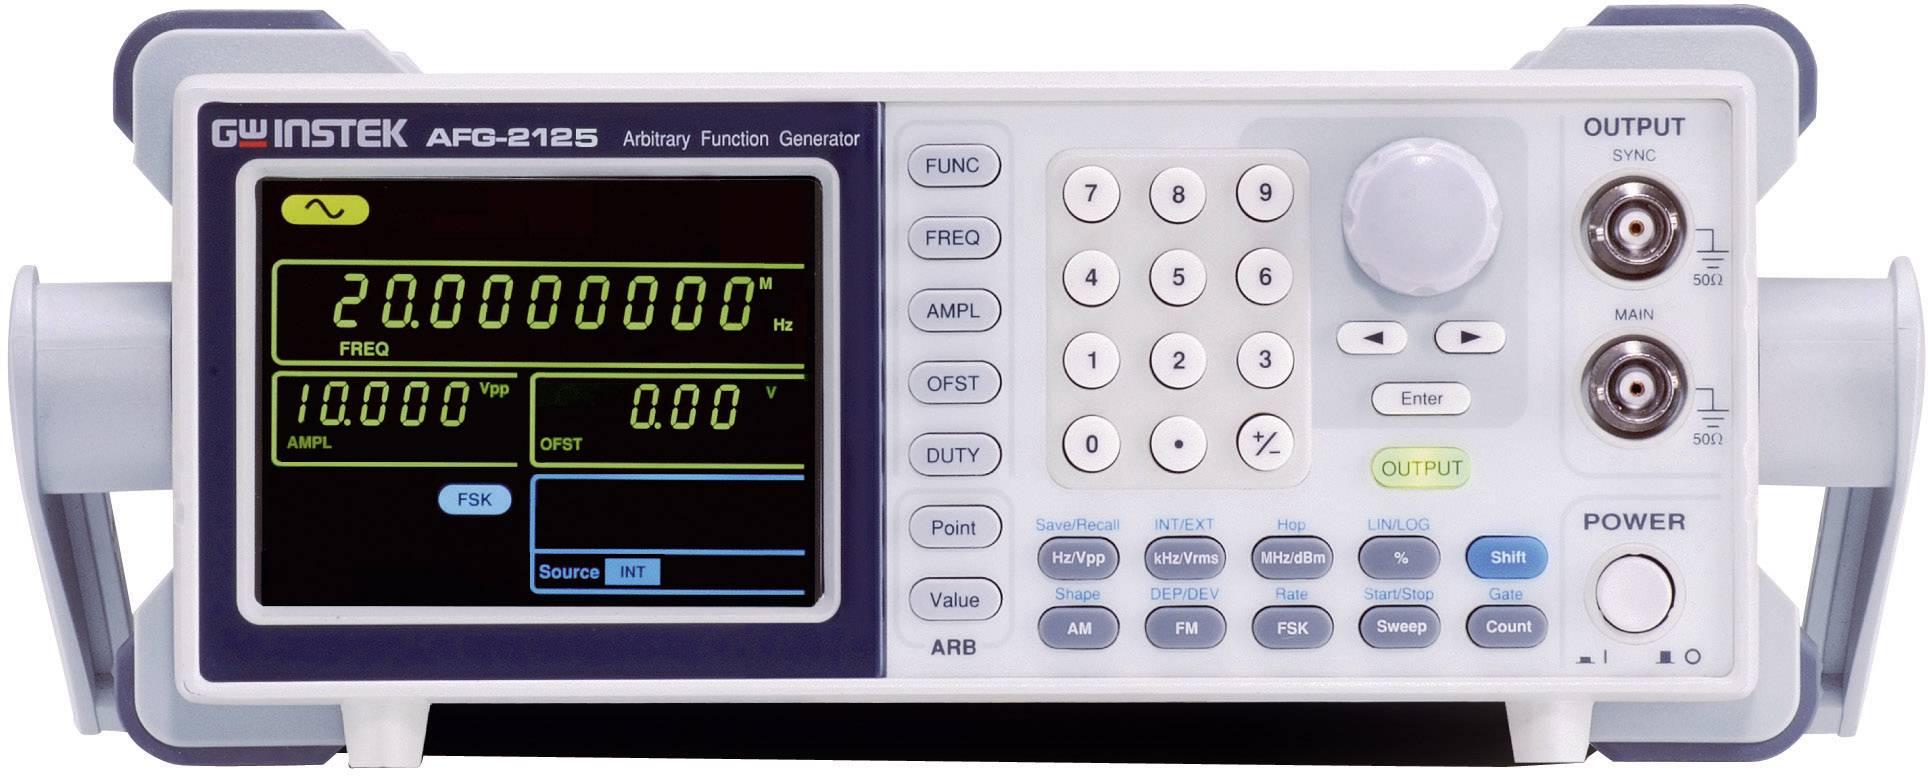 Generátor funkcí GW Instek AFG-2005, 0,1 Hz - 5 MHz